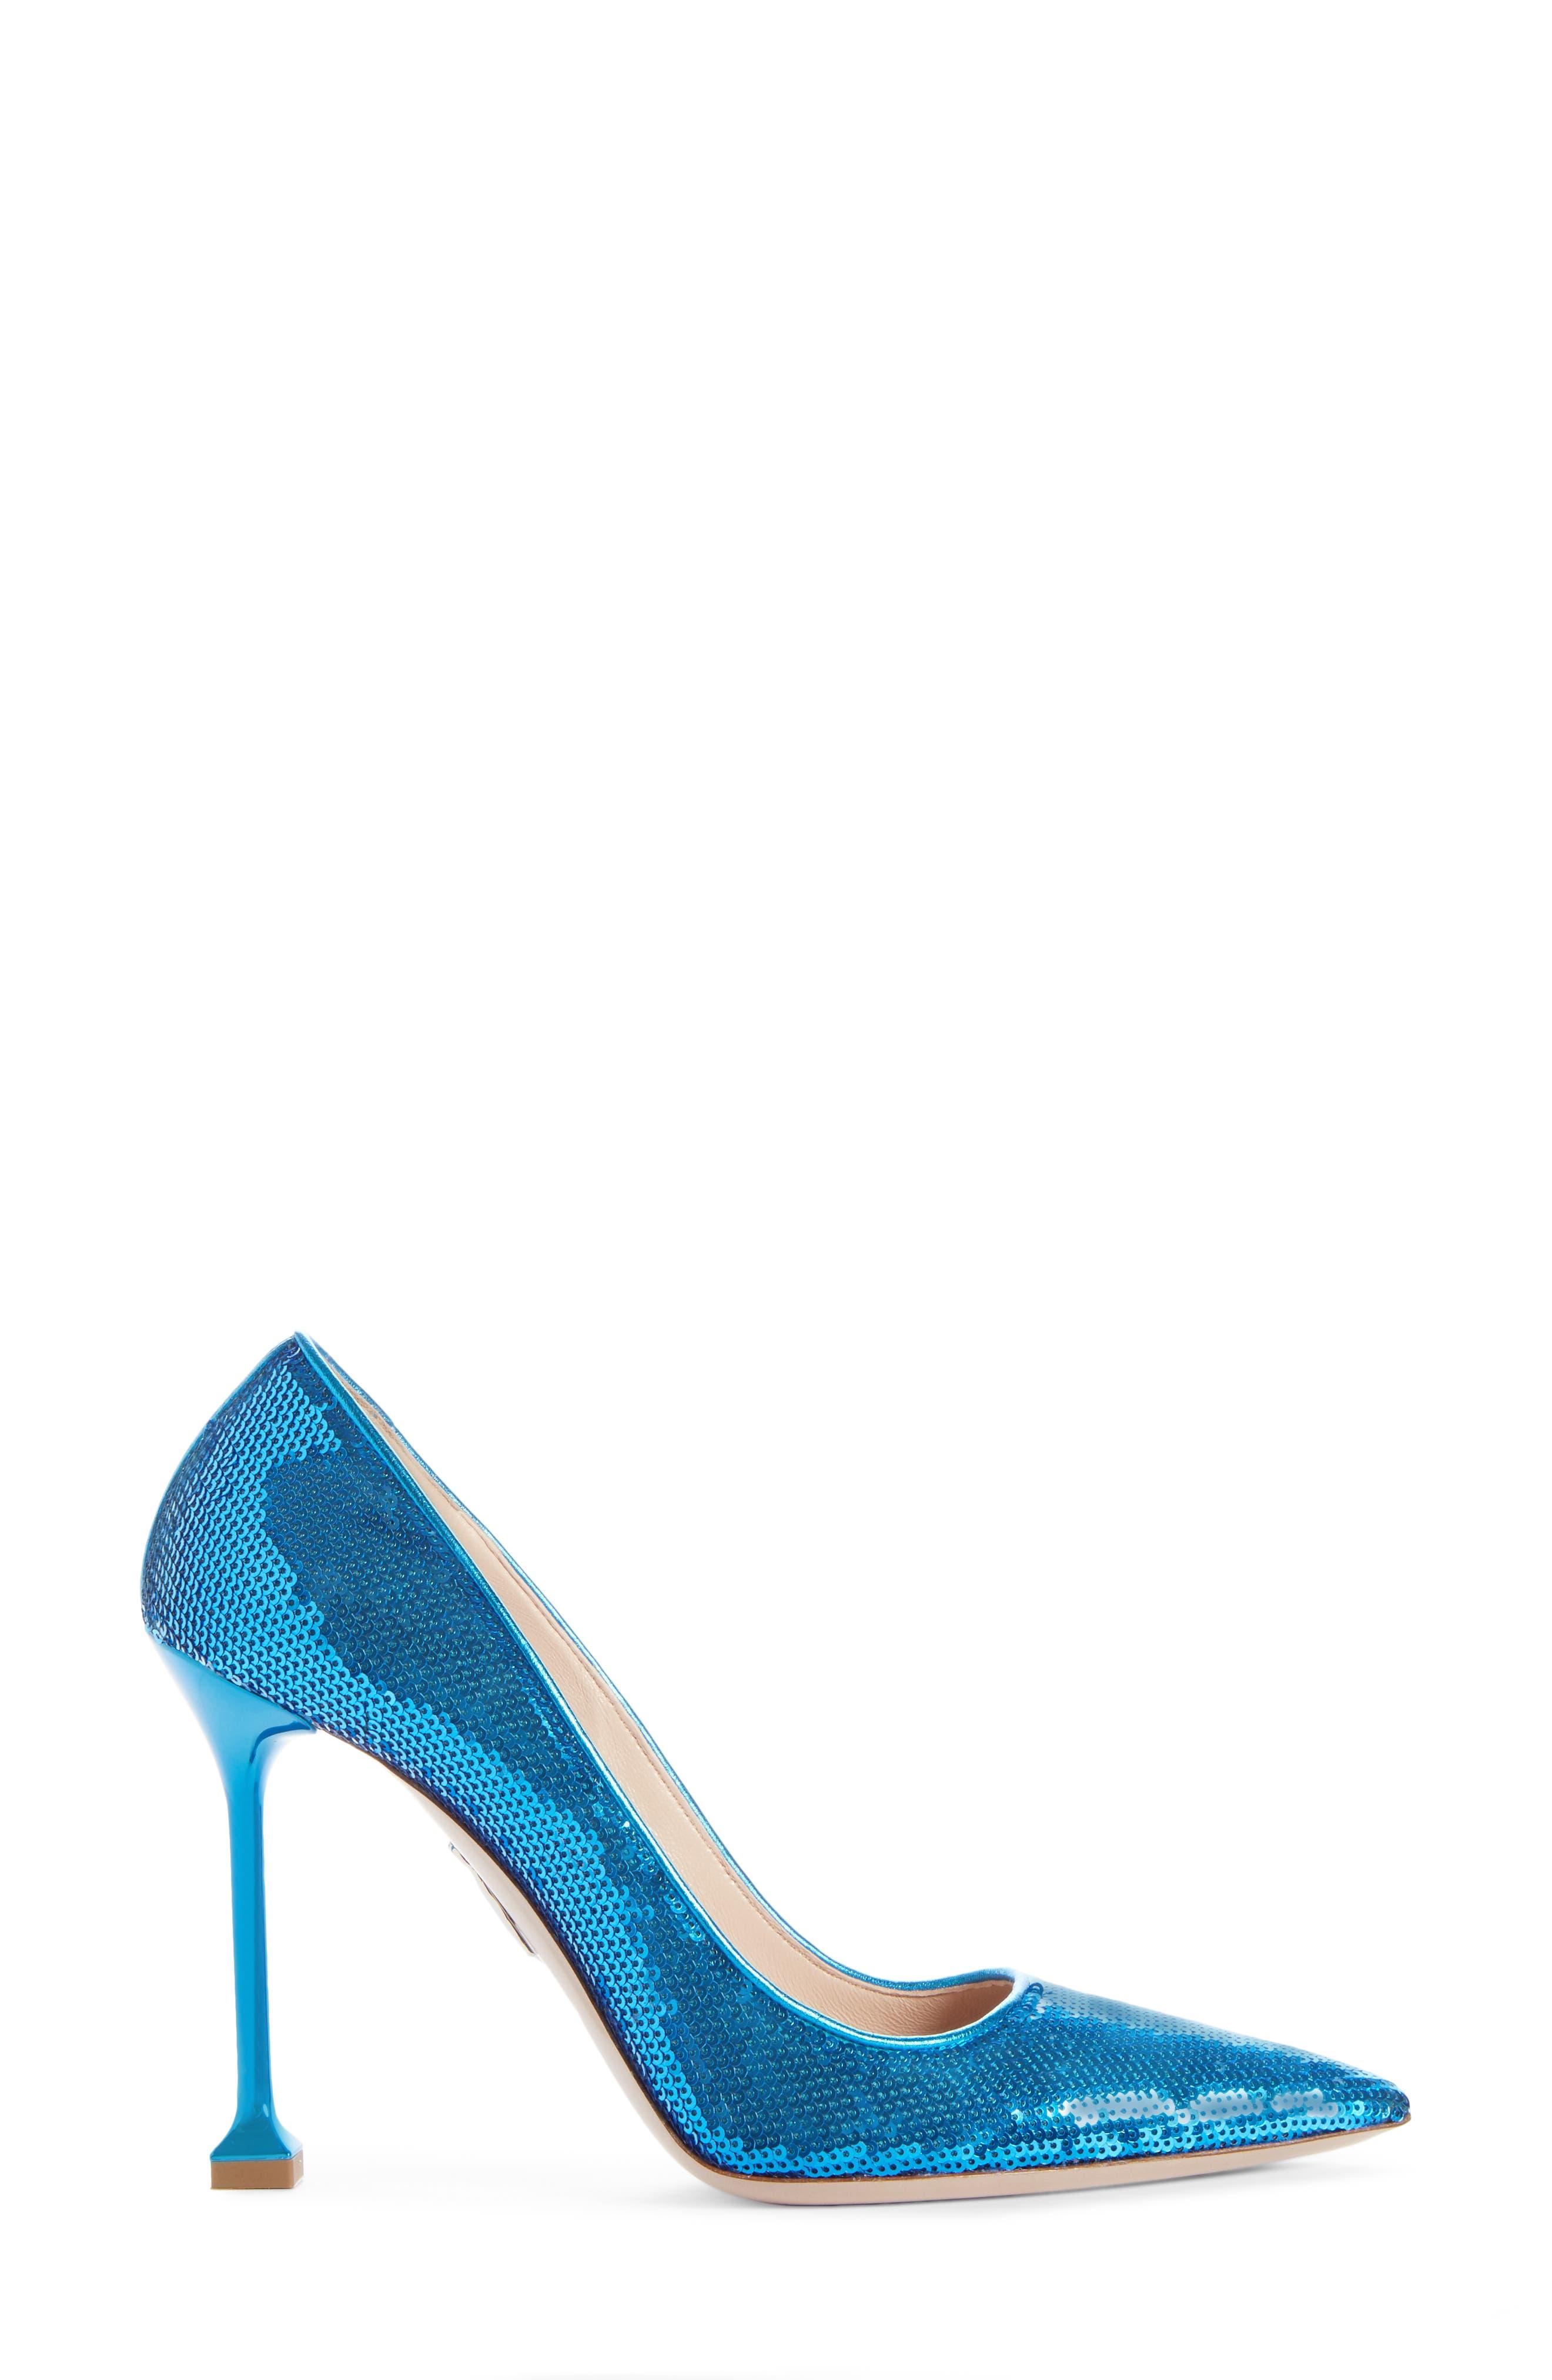 Sequin Pin Heel Pump,                             Alternate thumbnail 3, color,                             MAREA BLUE